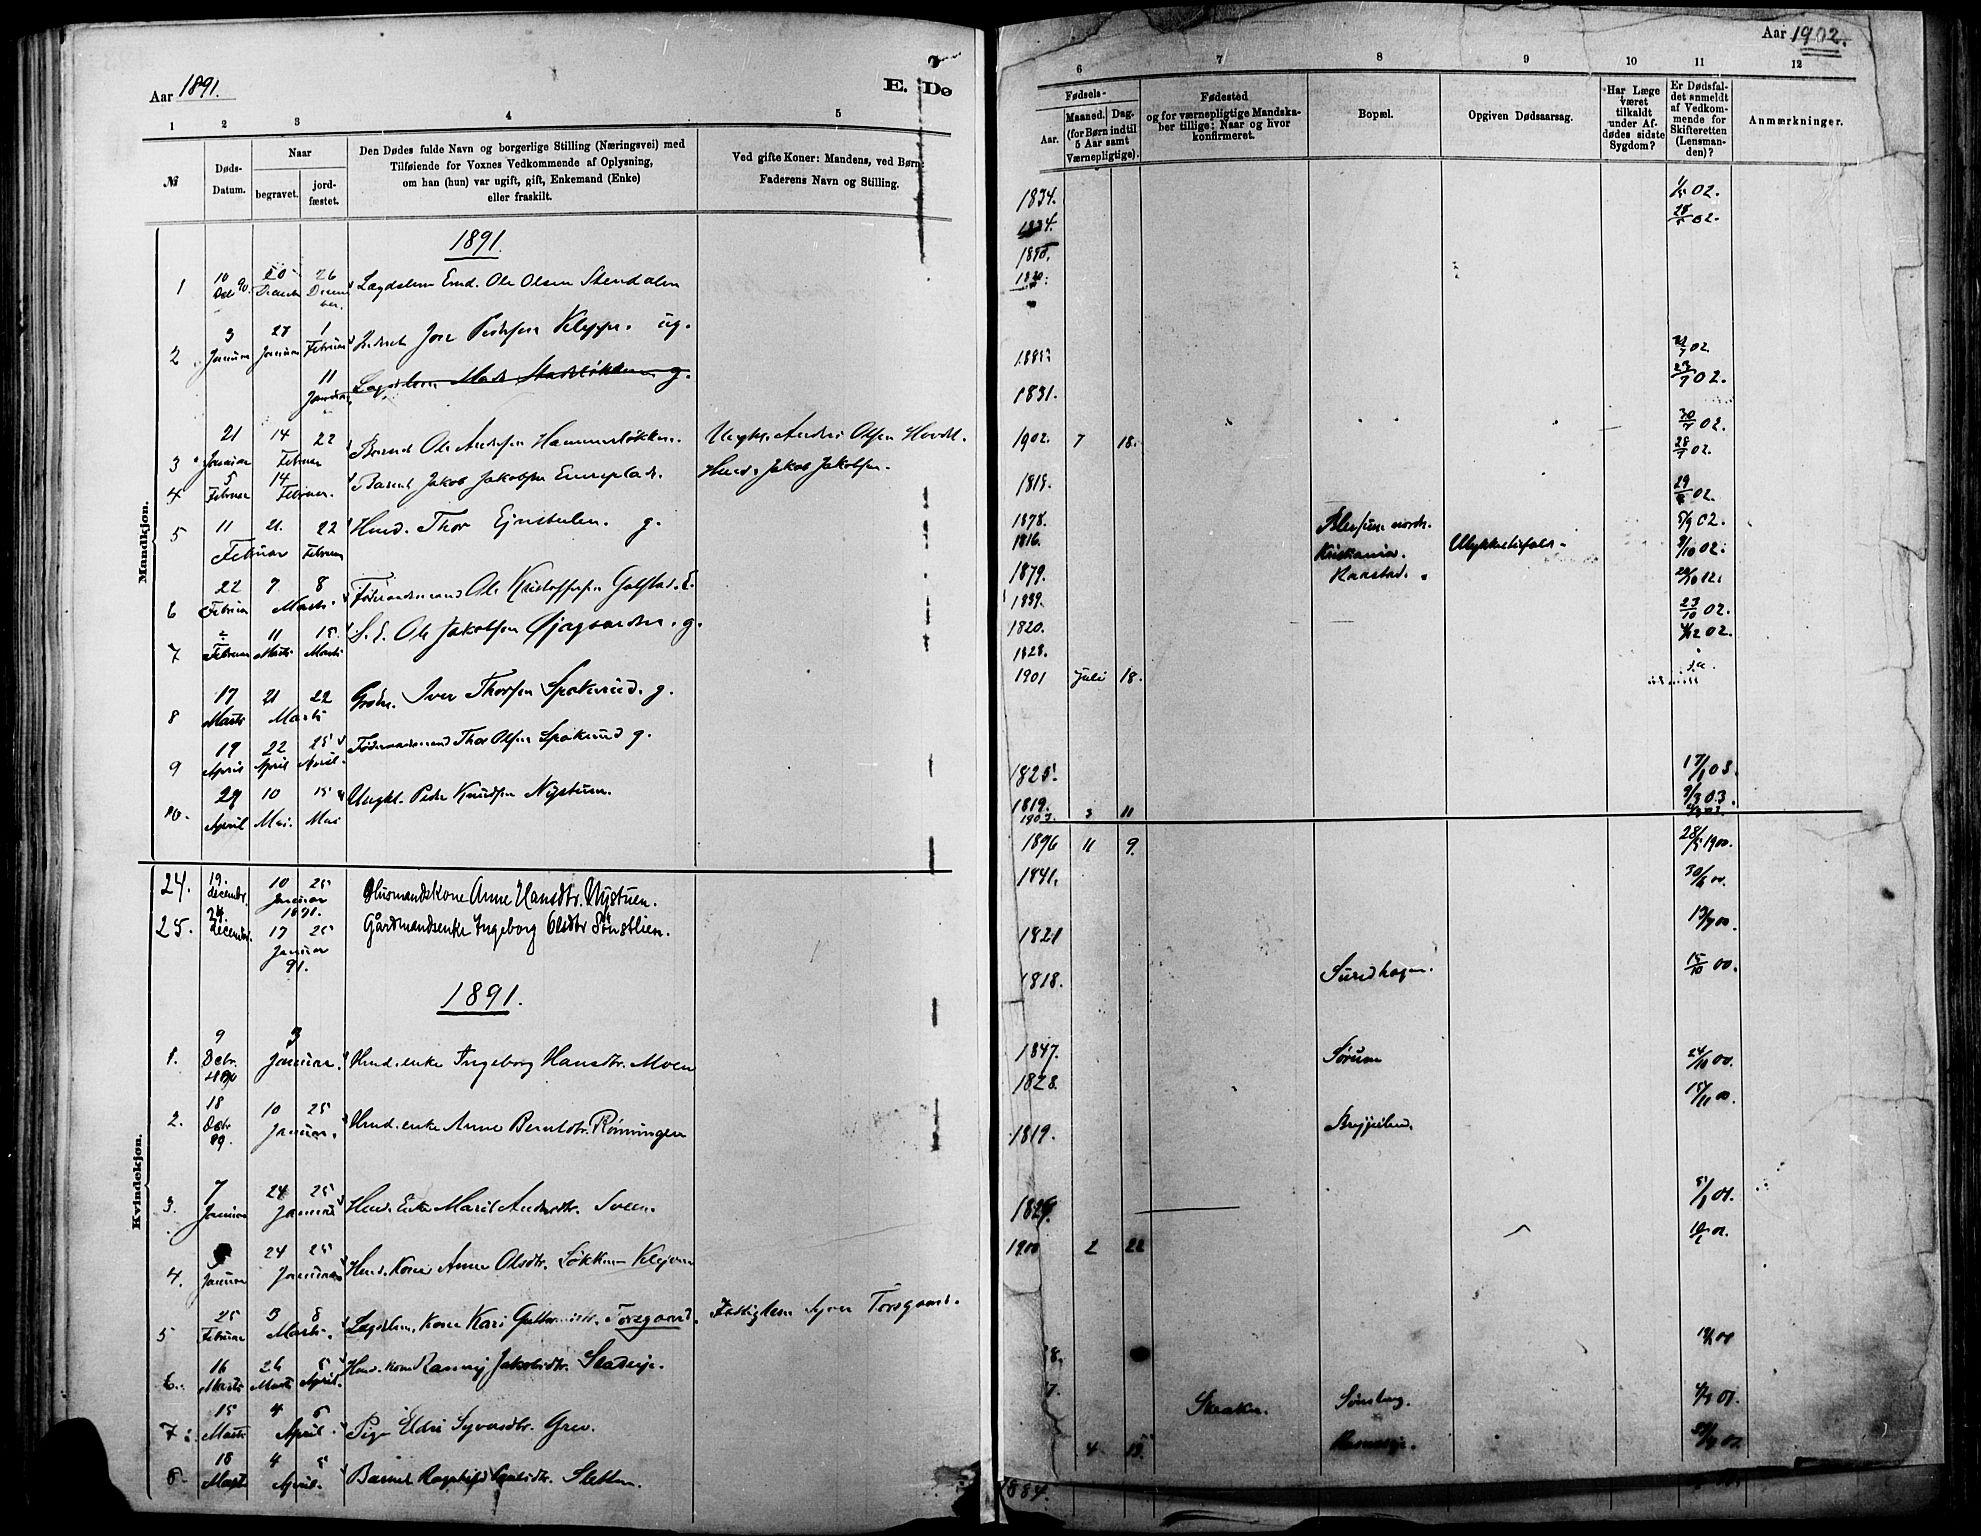 SAH, Vågå prestekontor, Ministerialbok nr. 9, 1886-1904, s. 194